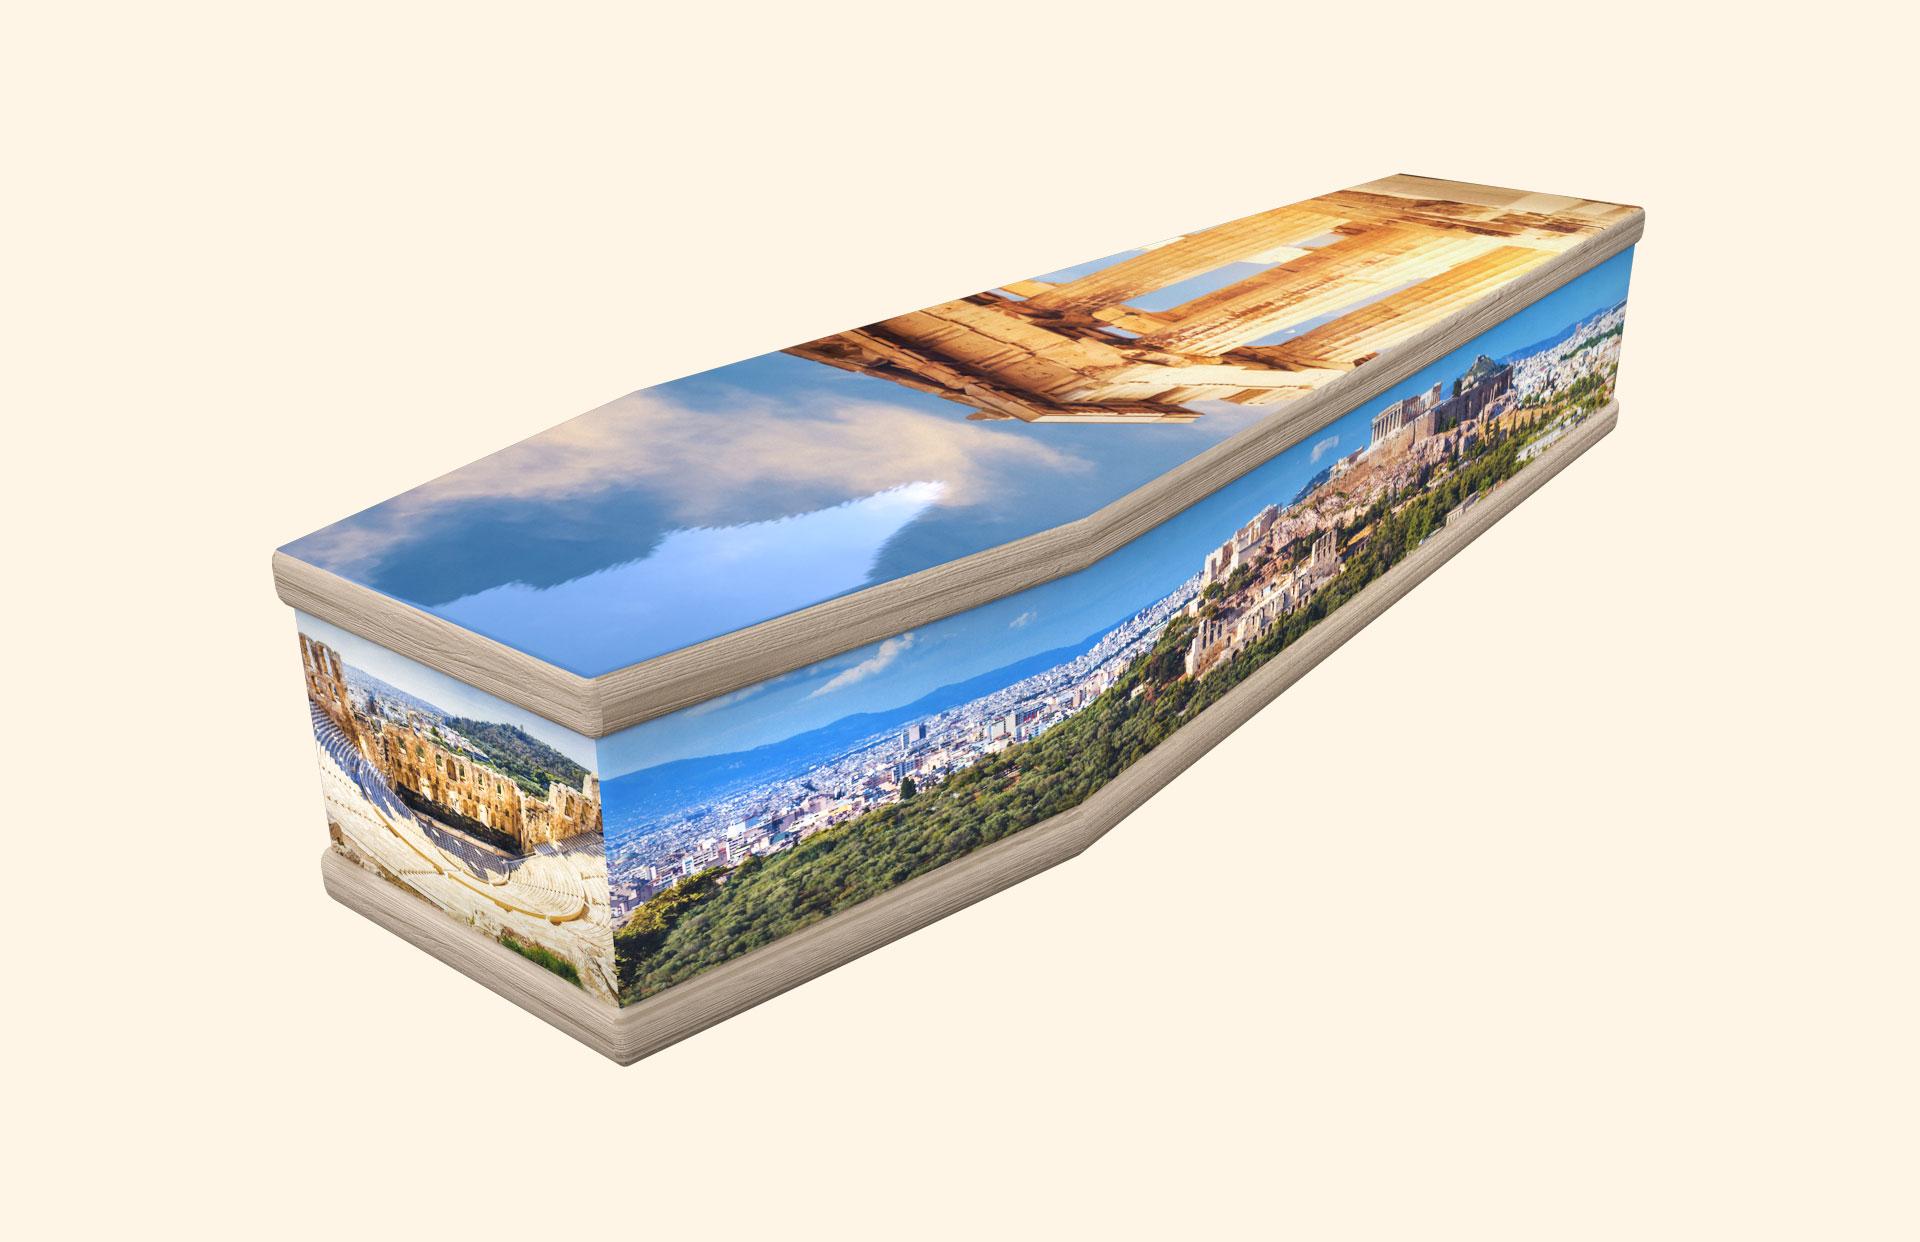 The Acropolis classic coffin